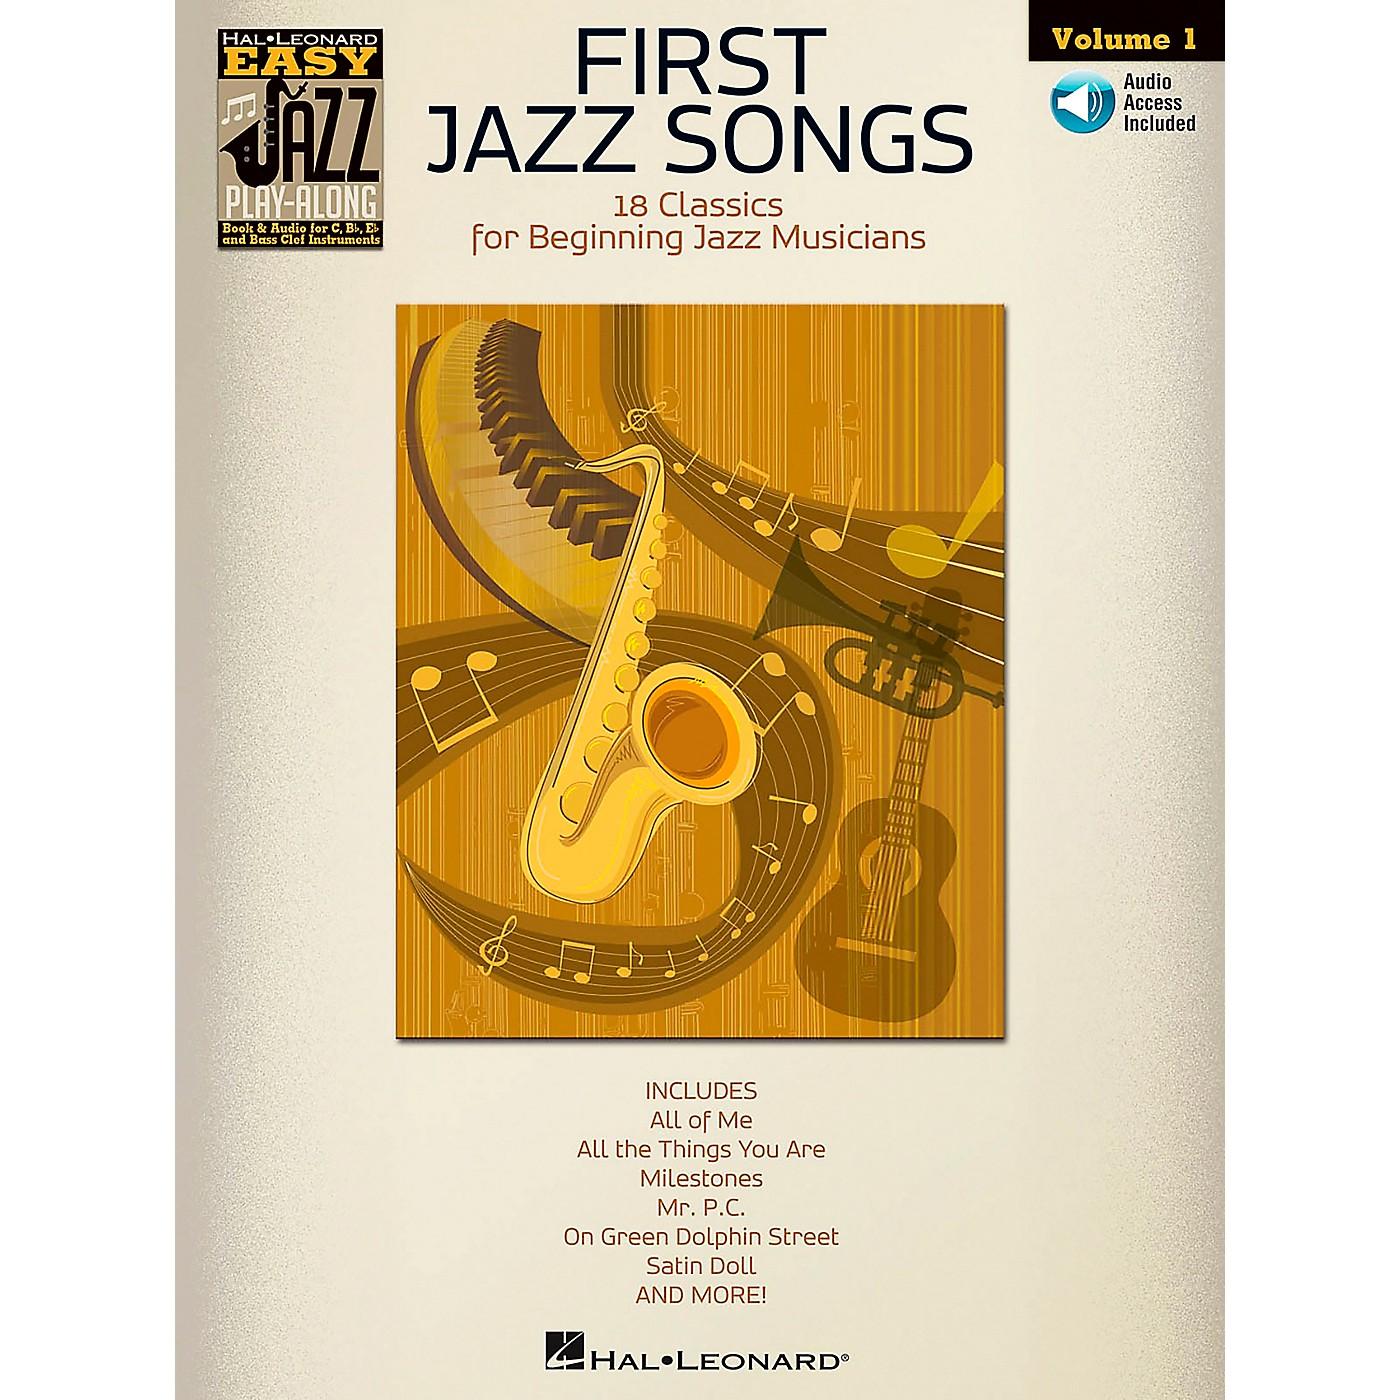 Hal Leonard First Jazz Songs - Easy Jazz Play-Along Vol. 1 Book/CD thumbnail